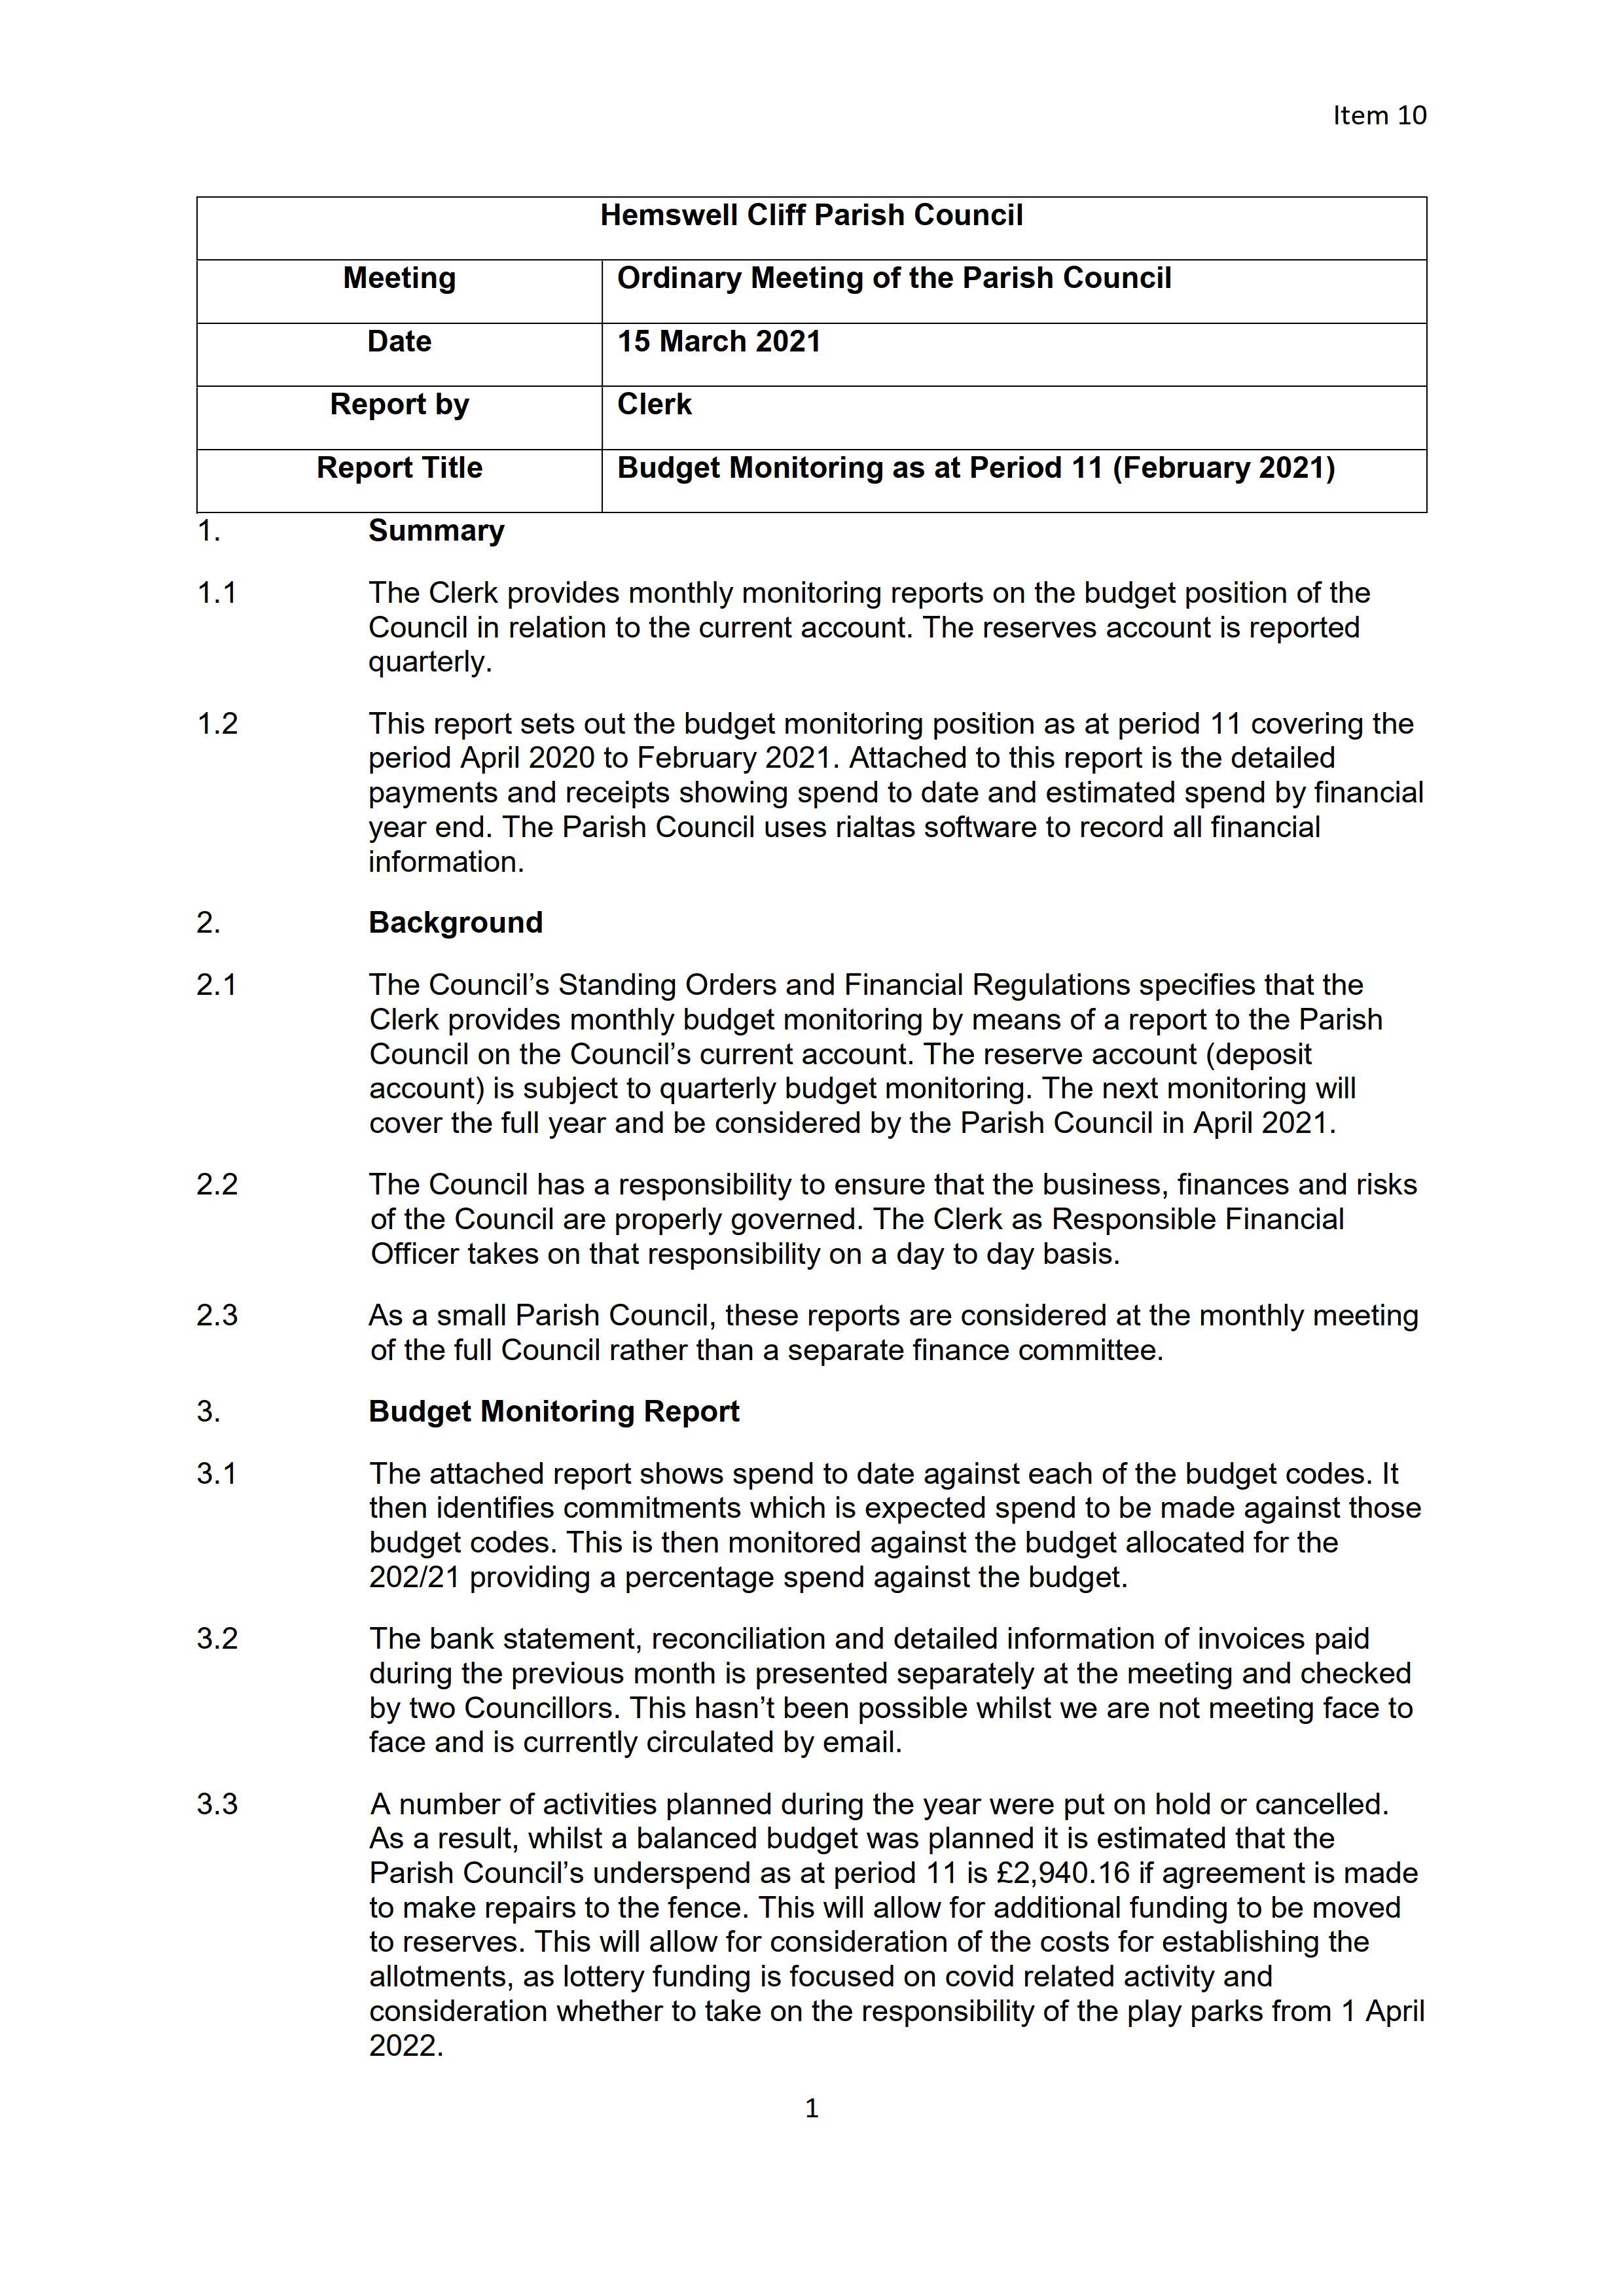 Item_10_Budget_Monitoring_report_1.png